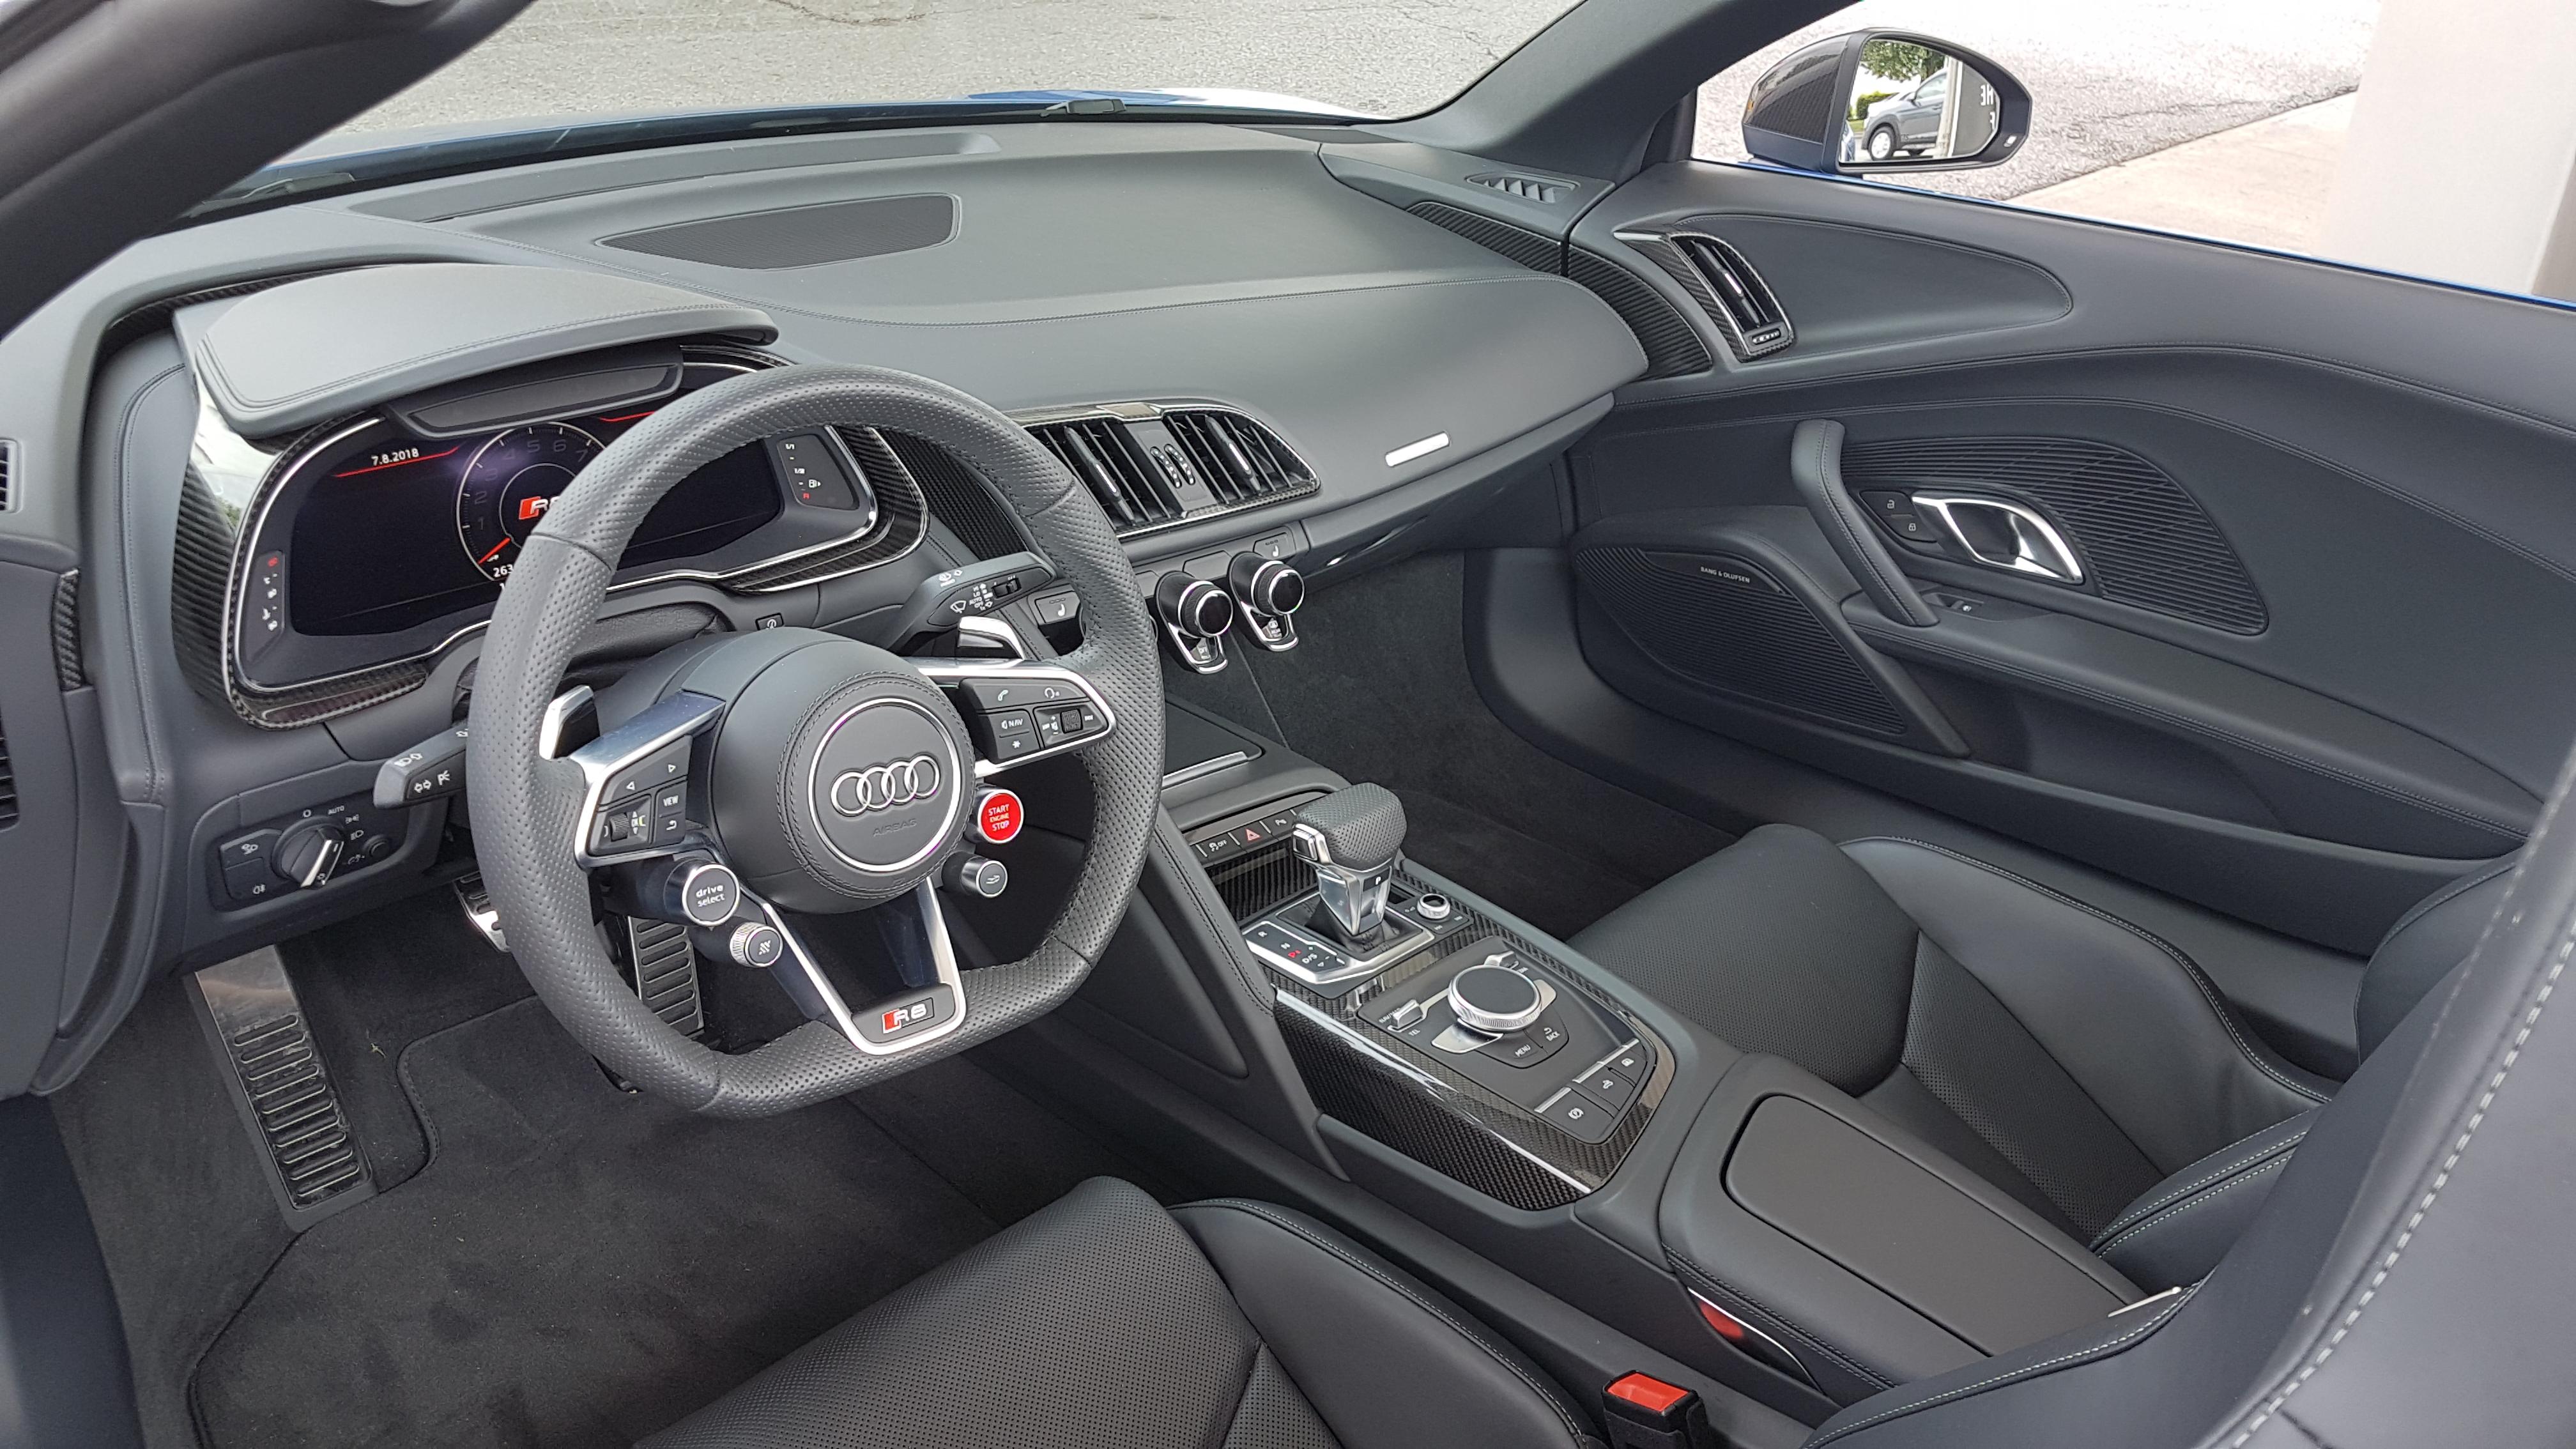 Review 2018 Audi R8 Spyder V10 Plus